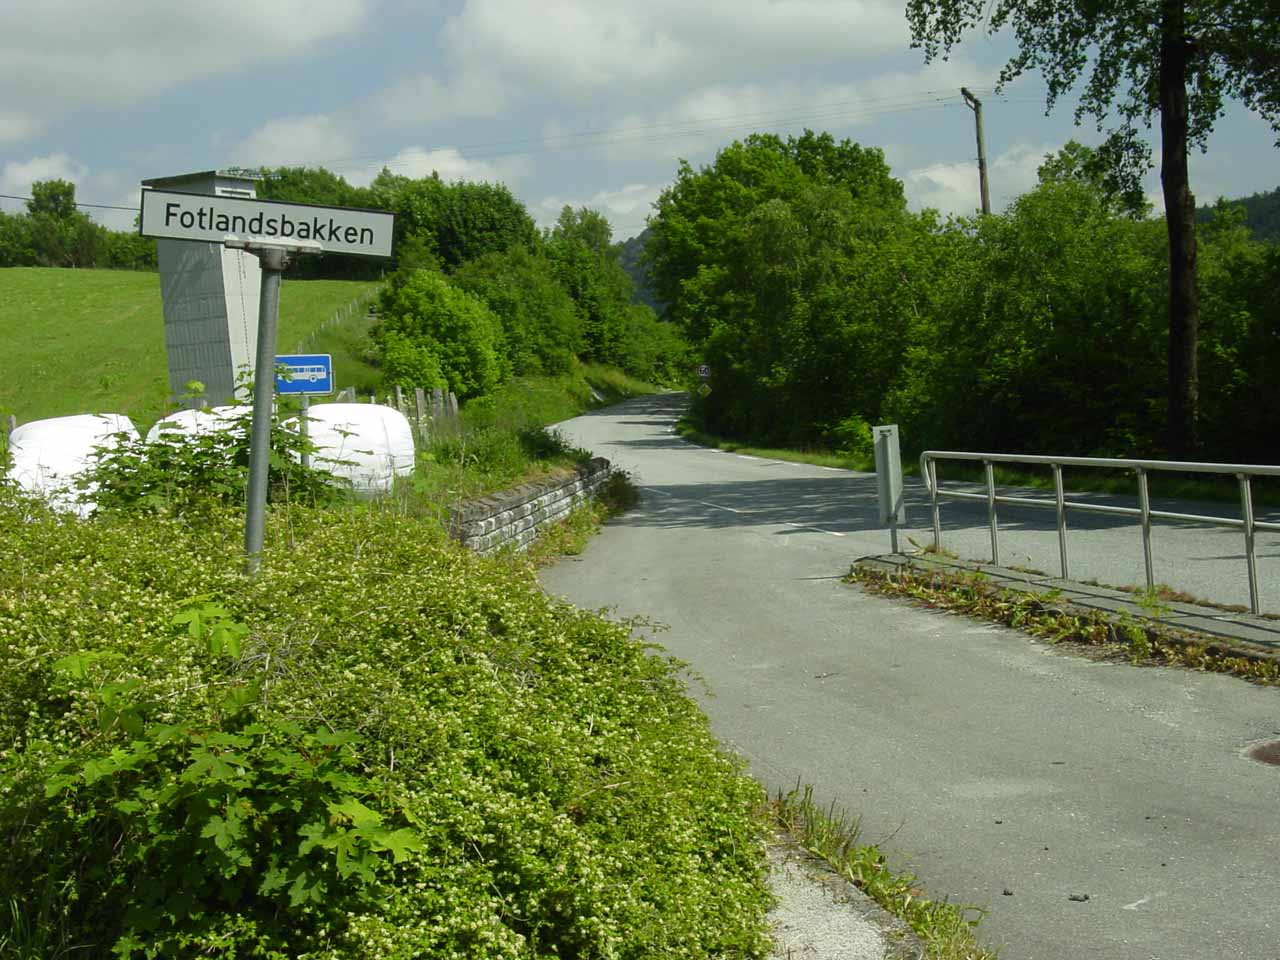 The Fotlandsbakken sign where we parked the car